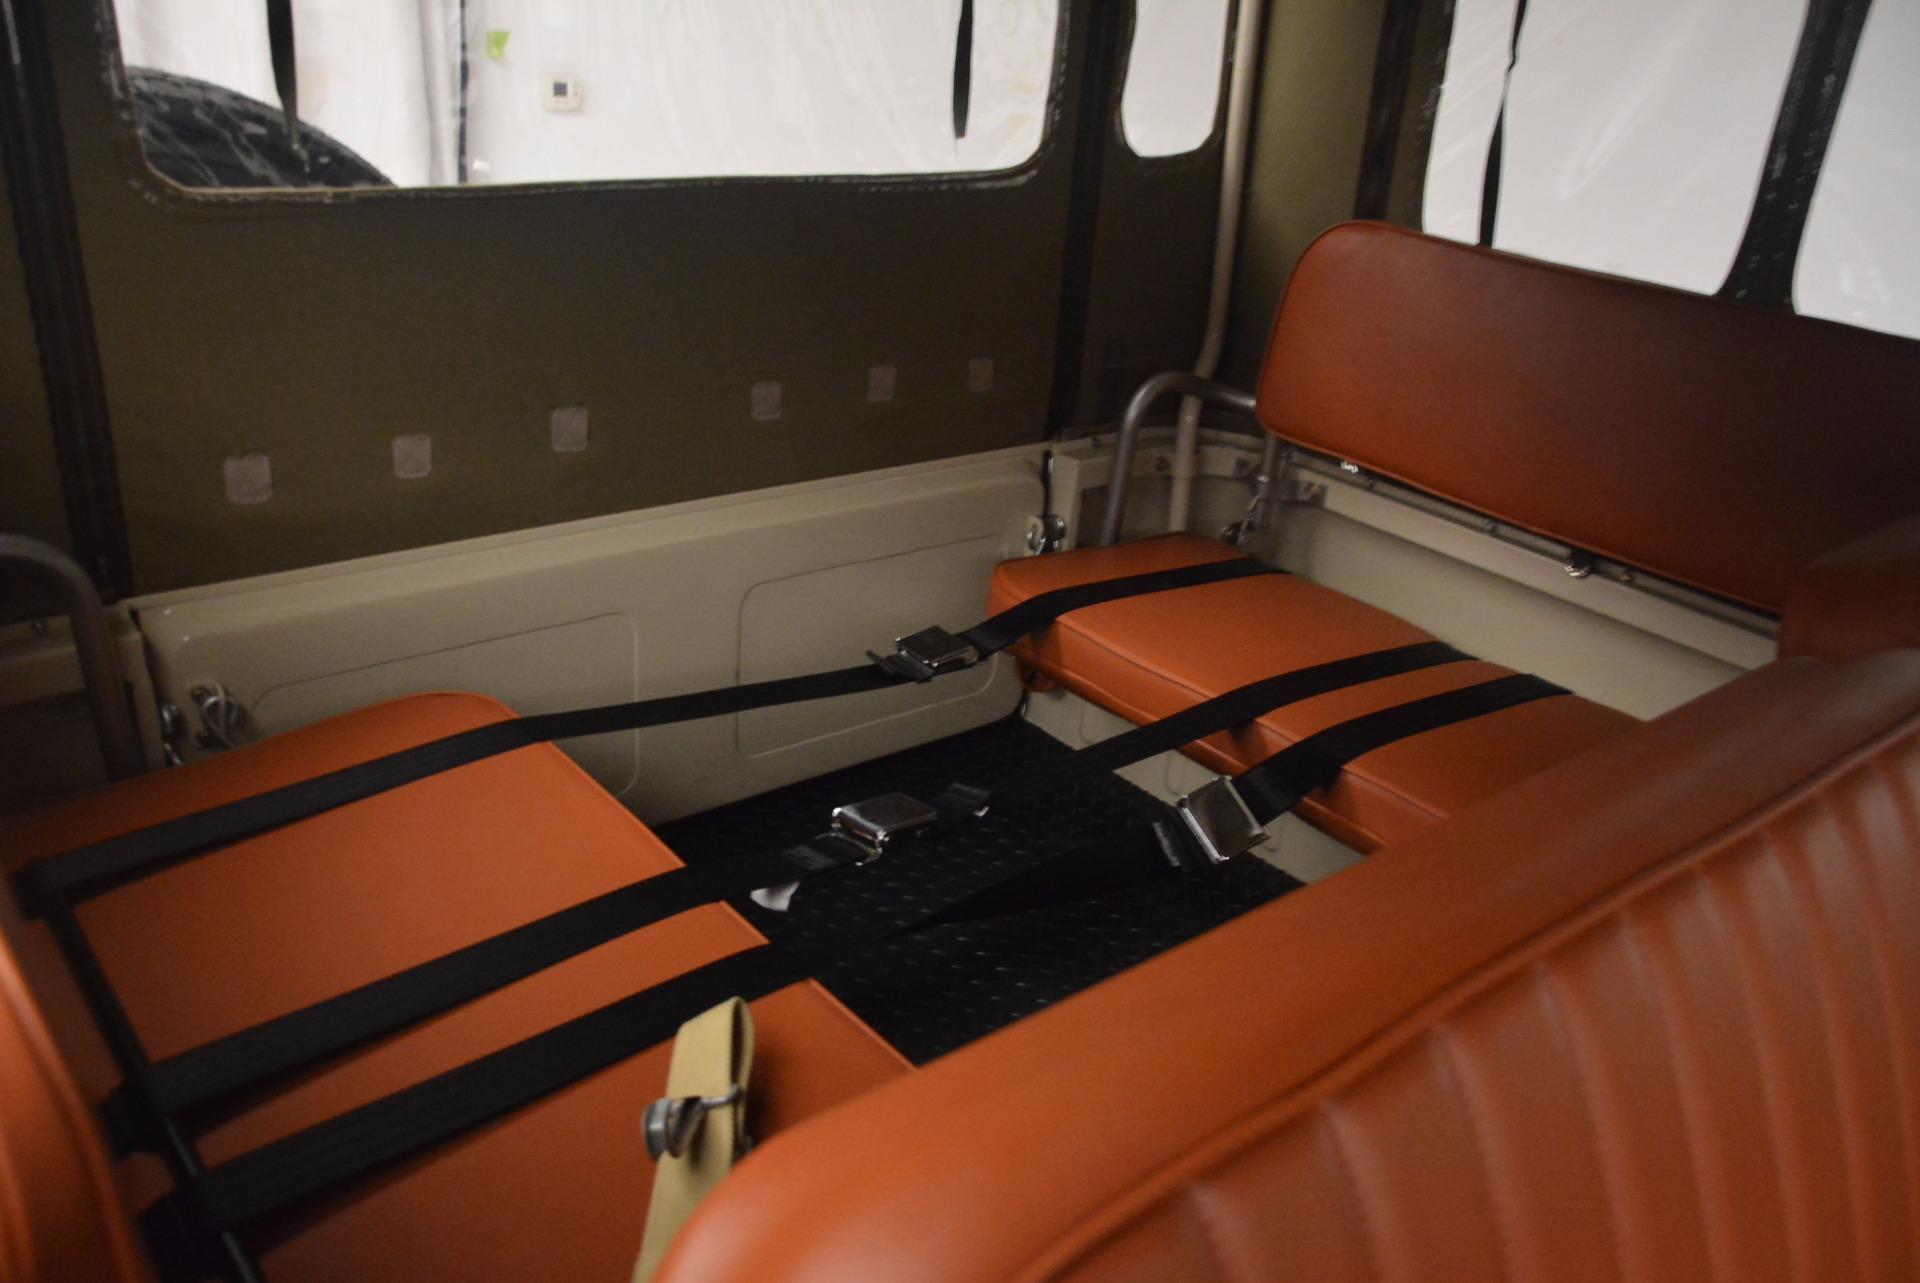 Used 1966 Toyota FJ40 Land Cruiser Land Cruiser | Greenwich, CT